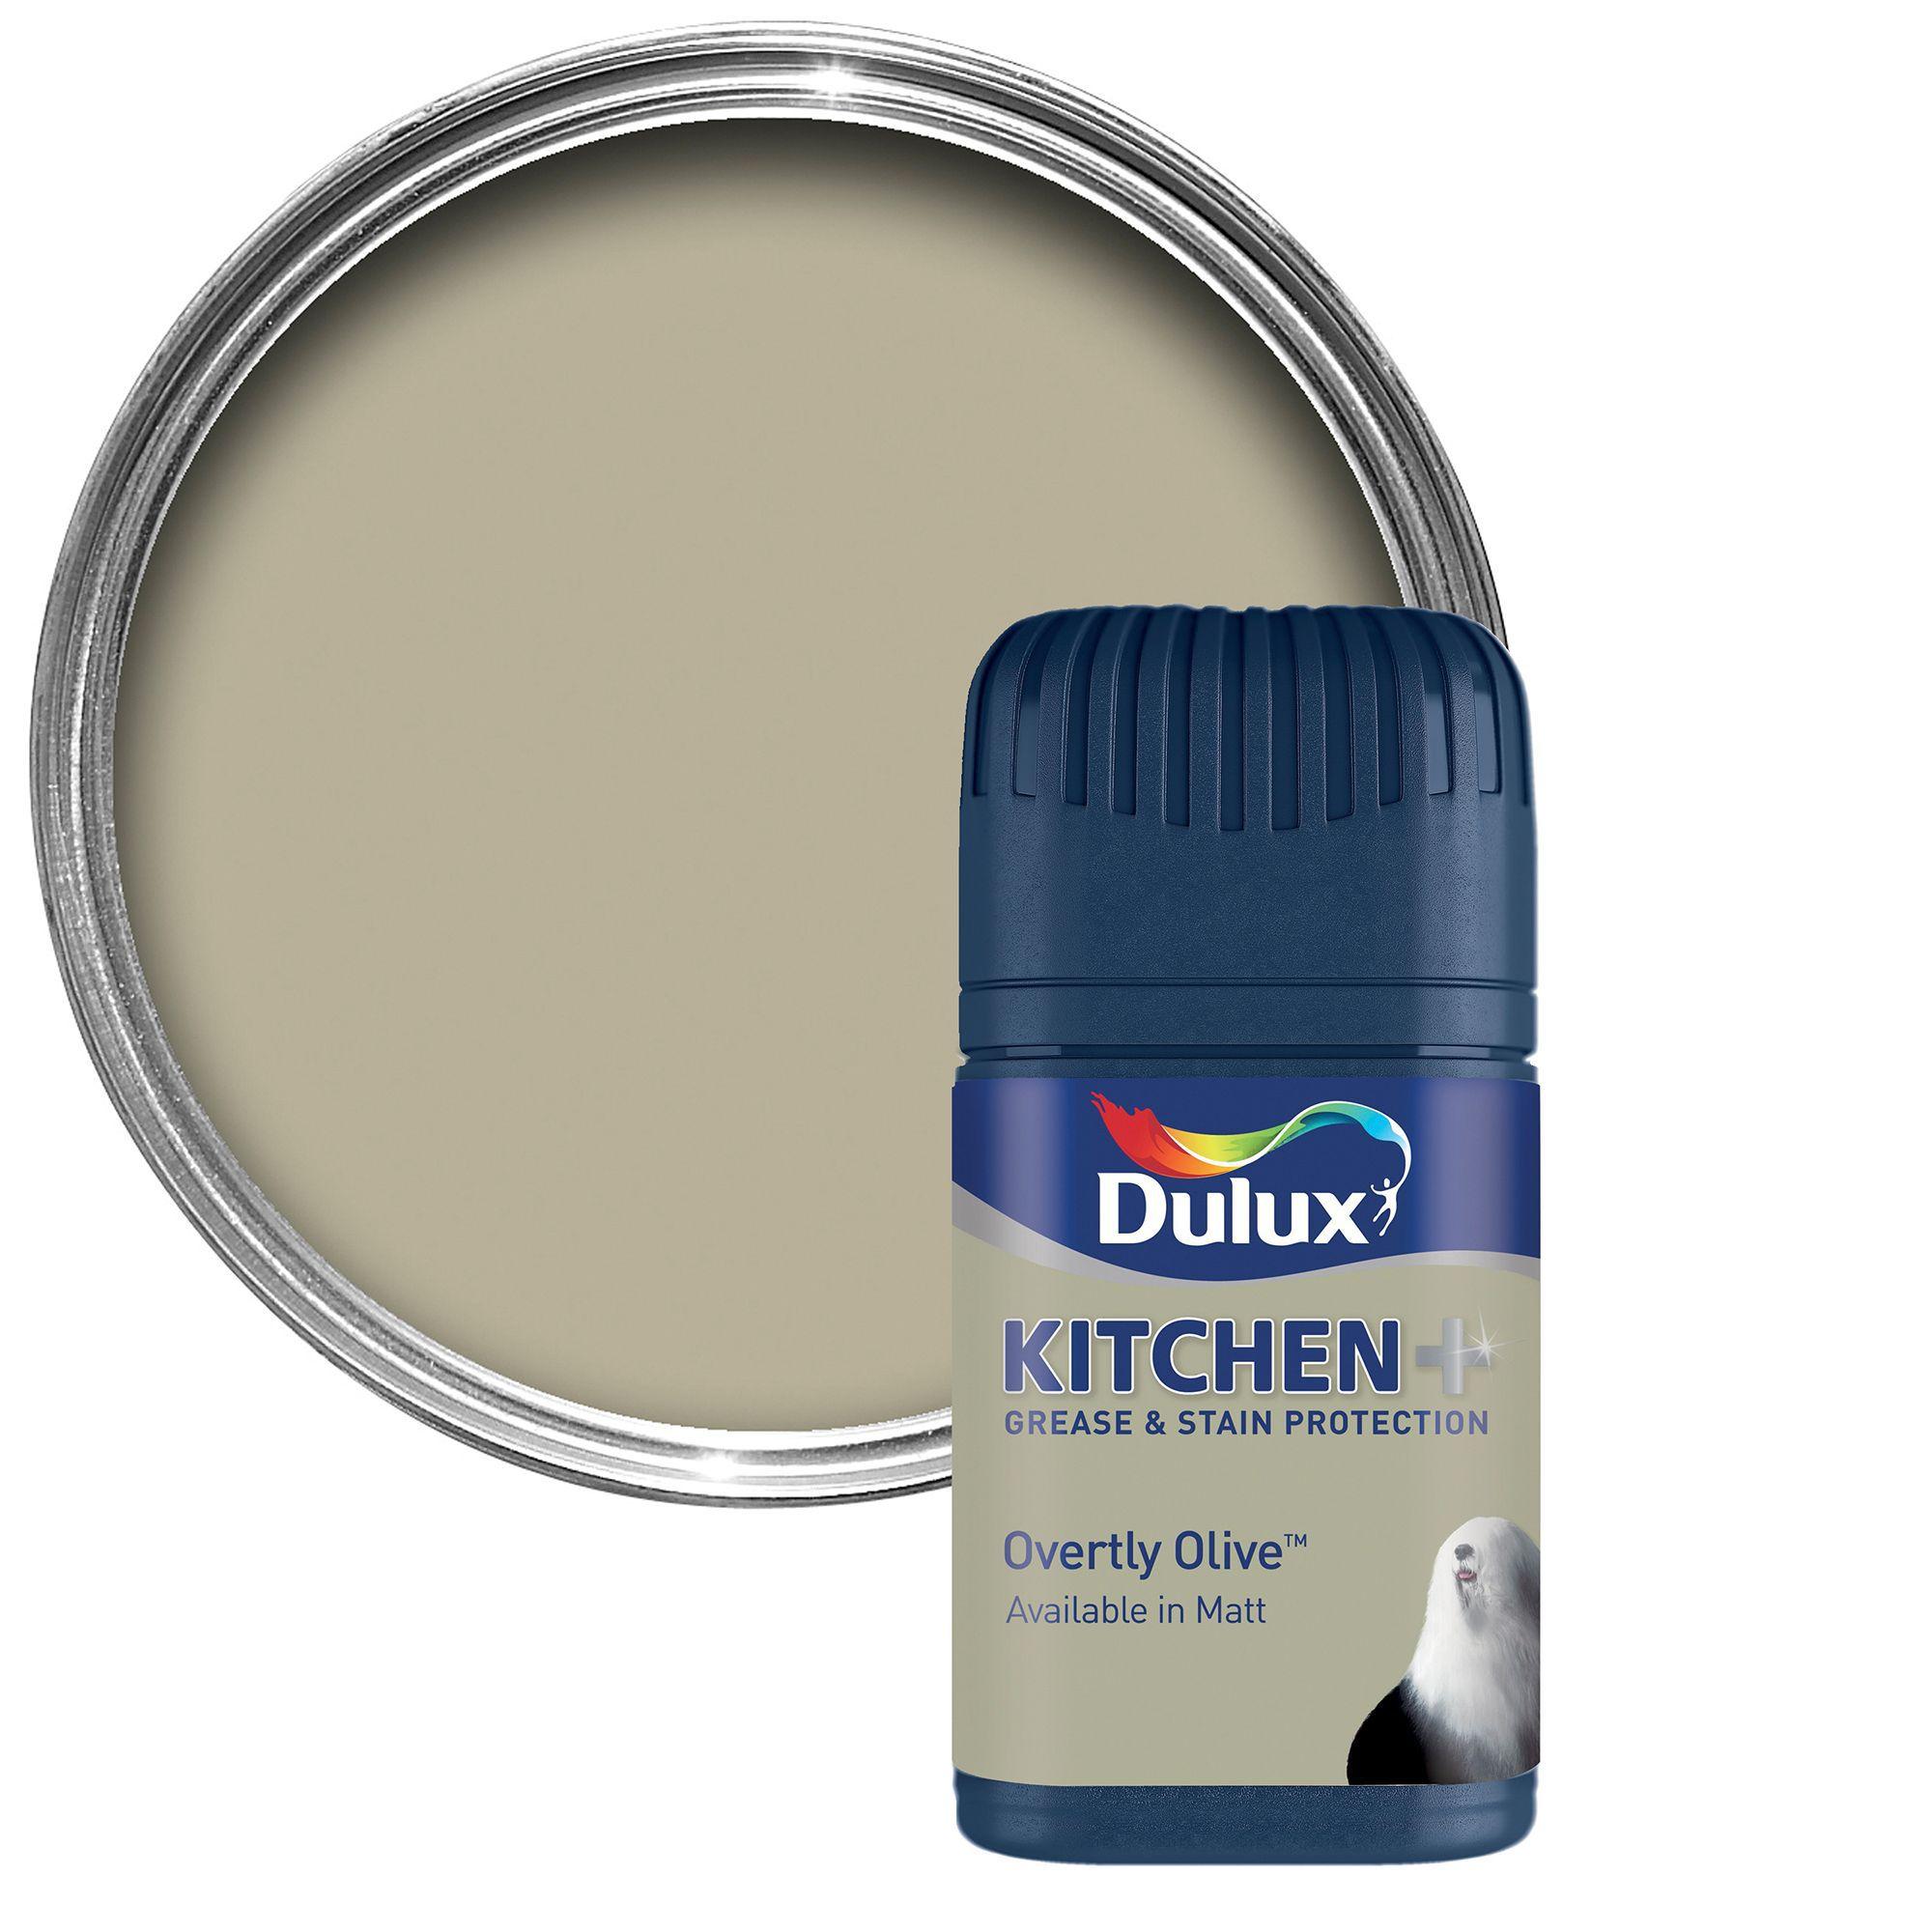 Overtly Olive Kitchen Paint: Dulux Kitchen Overtly Olive Matt Emulsion Paint 0.05L